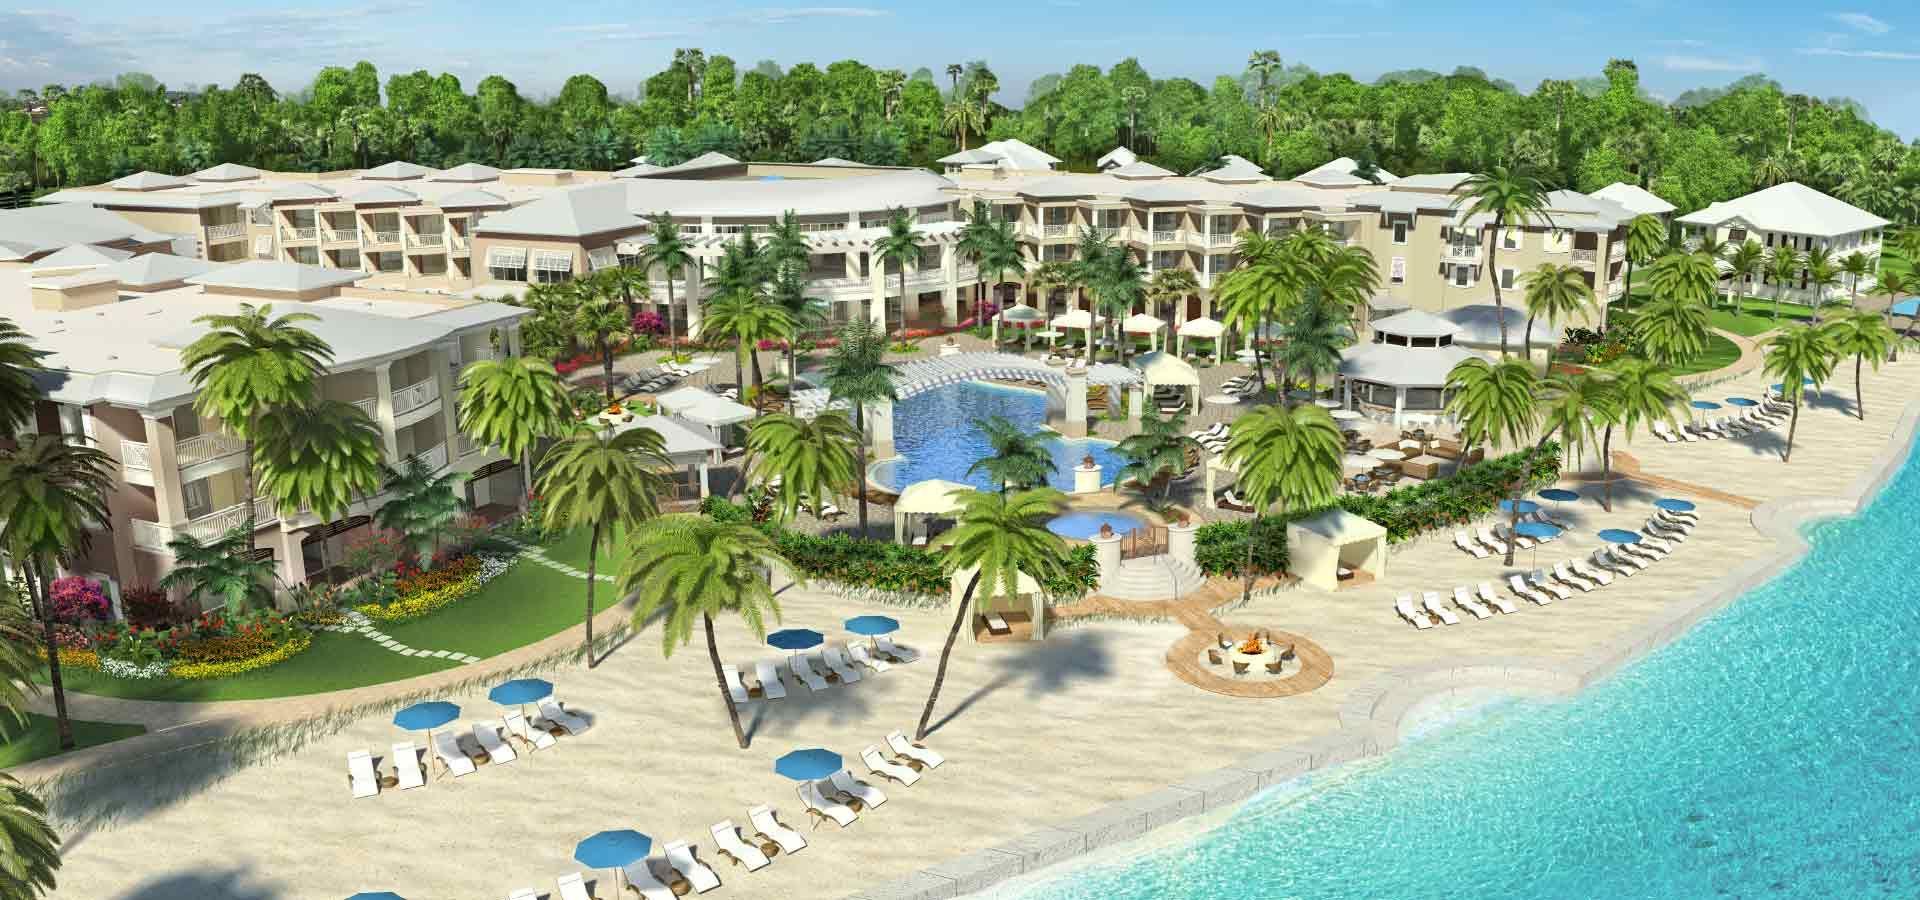 Resort - Playa Largo & Spa Wanna